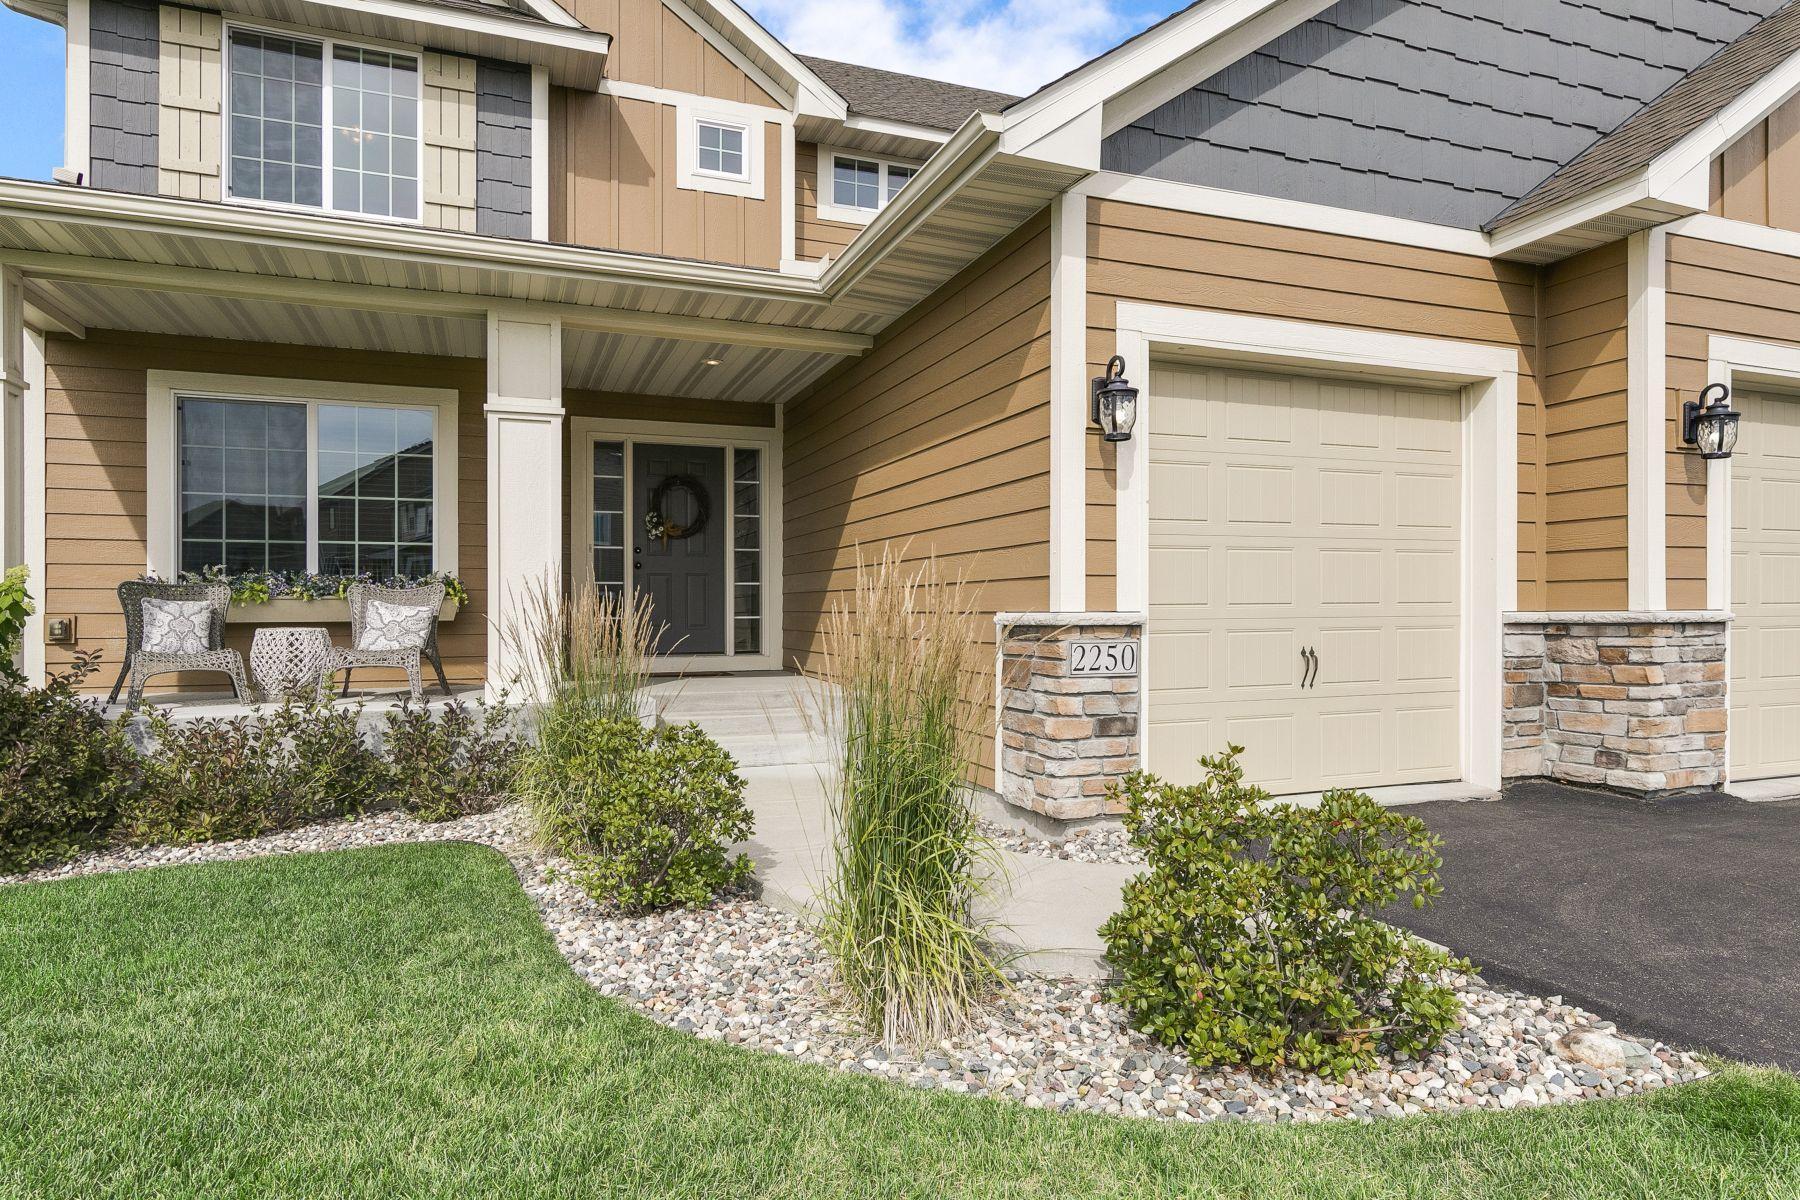 2250 Jennifer Lane Property Photo - Shakopee, MN real estate listing